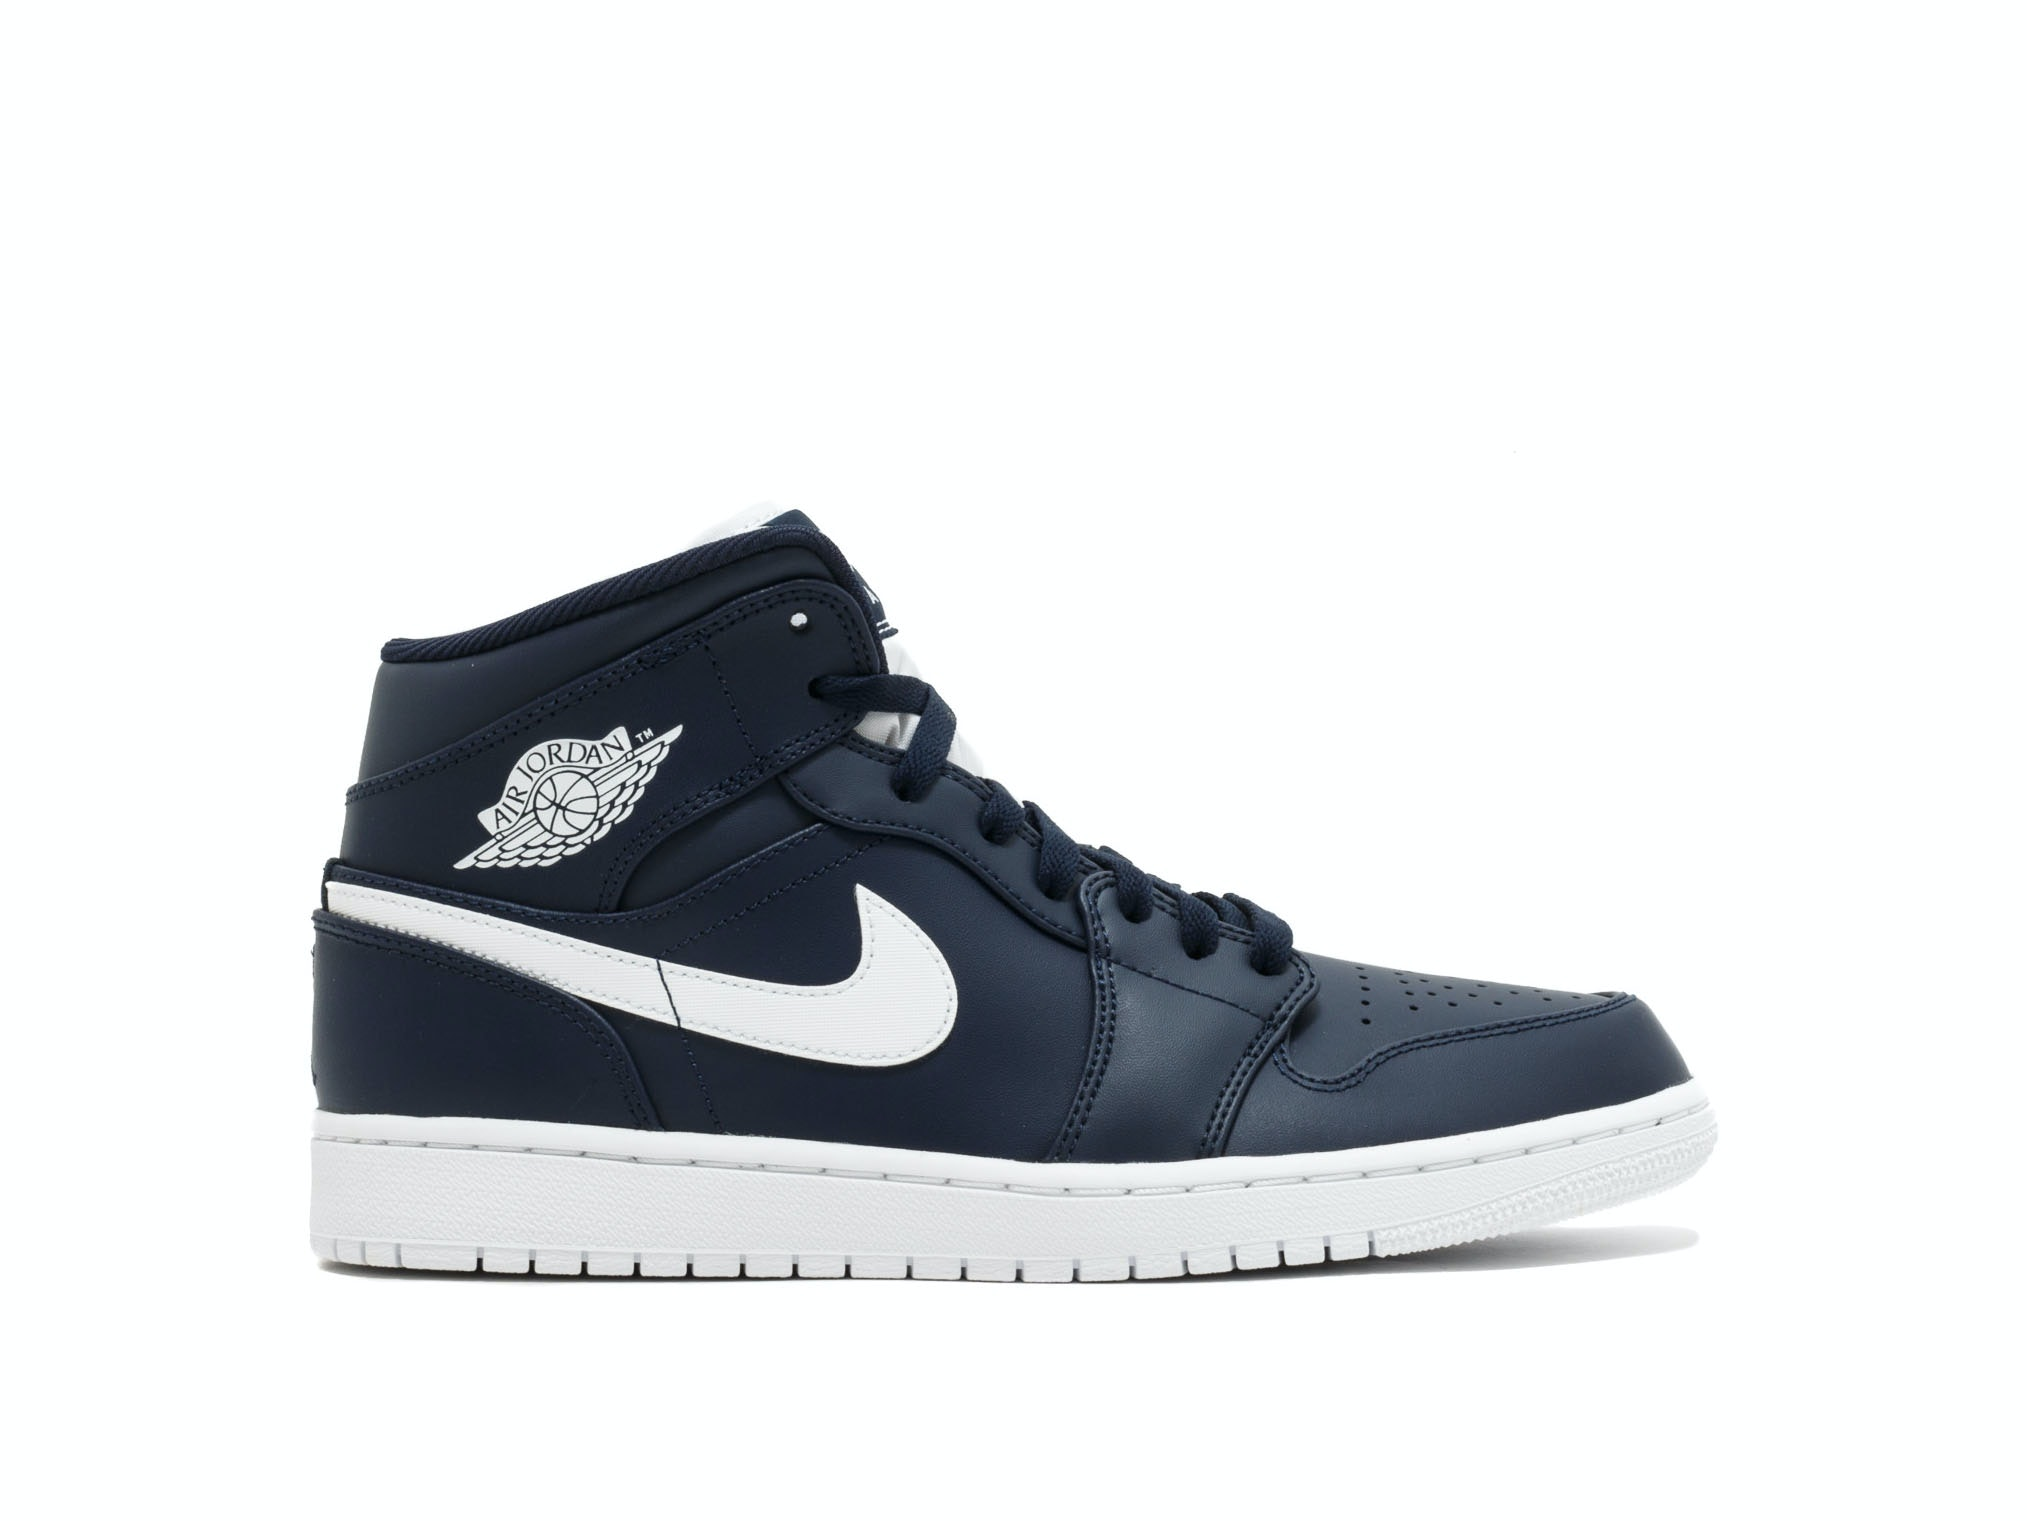 79d20ab228aaa9 Shop Air Jordan 1 Retro Mid Obsidian Online